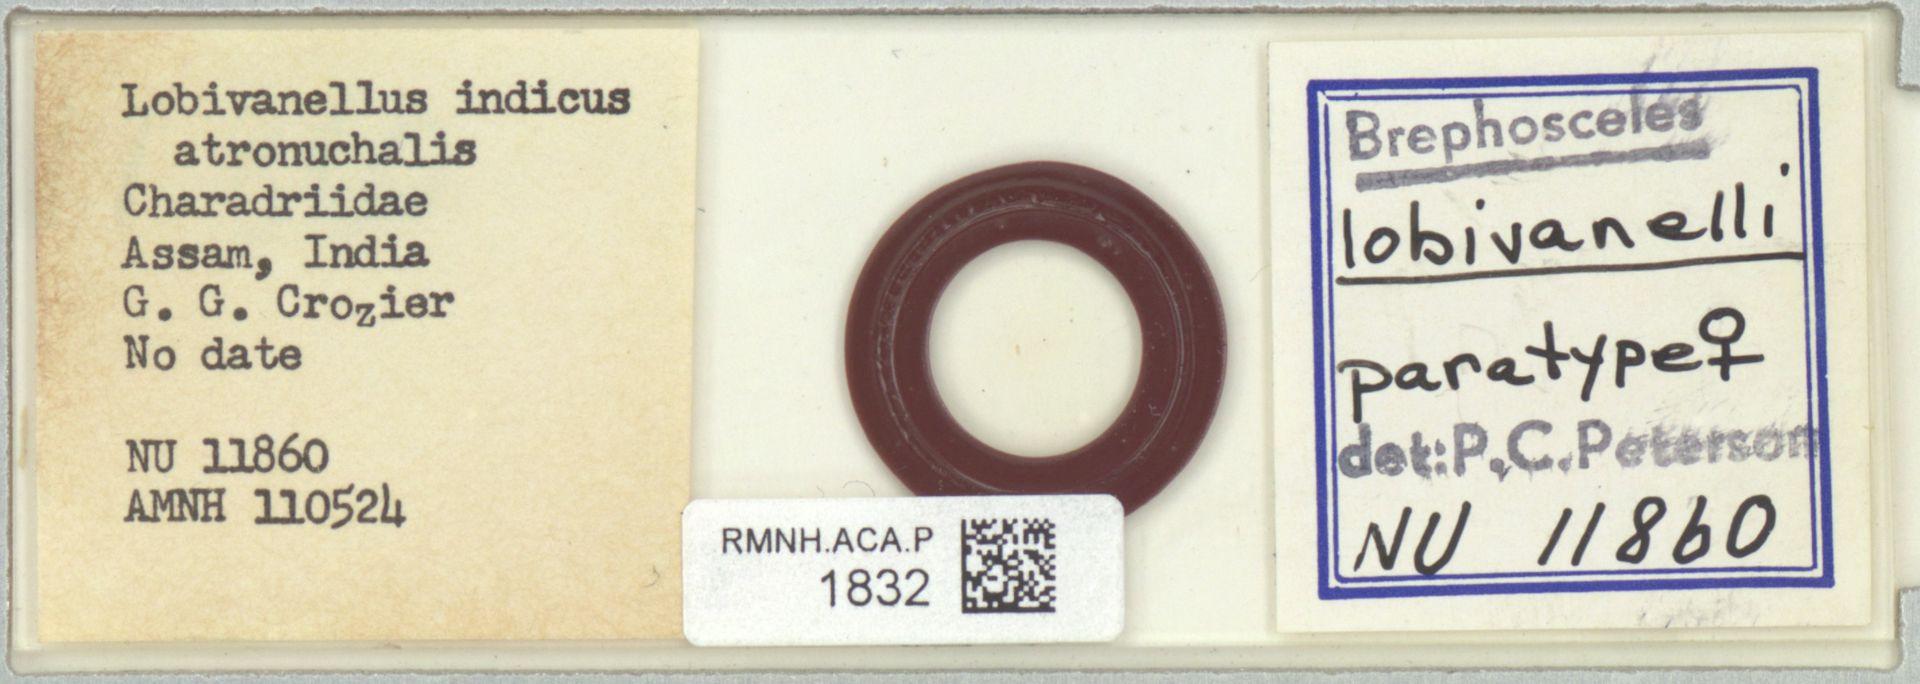 RMNH.ACA.P.1832 | Brephosceles lobivanelli P.C.Peterson